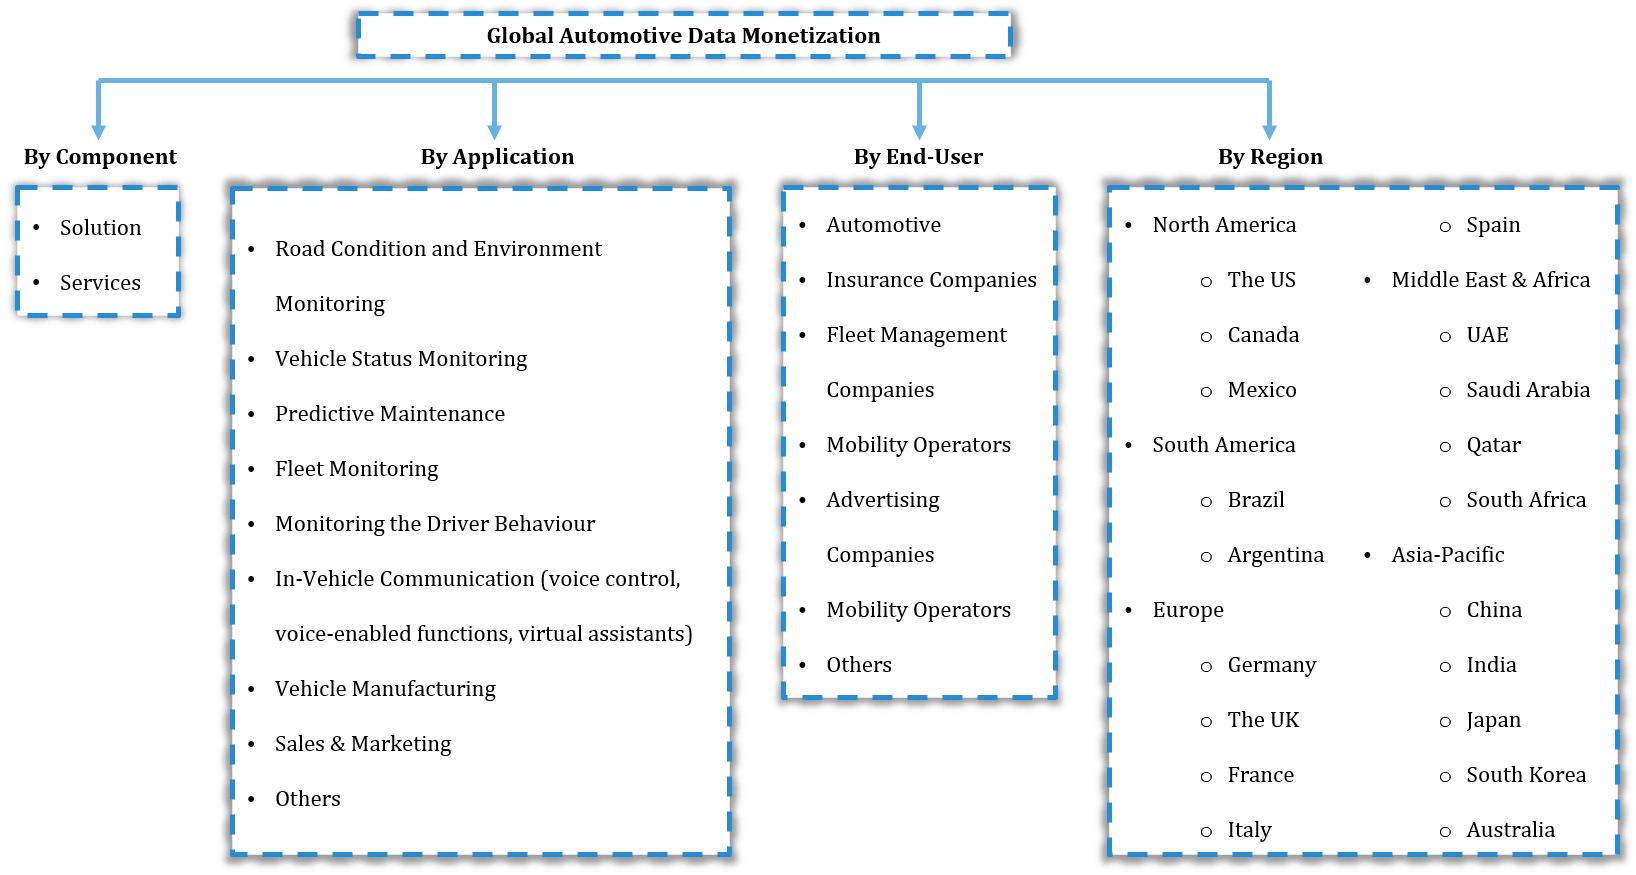 Global Automotive Data Monetization Market Segmentation